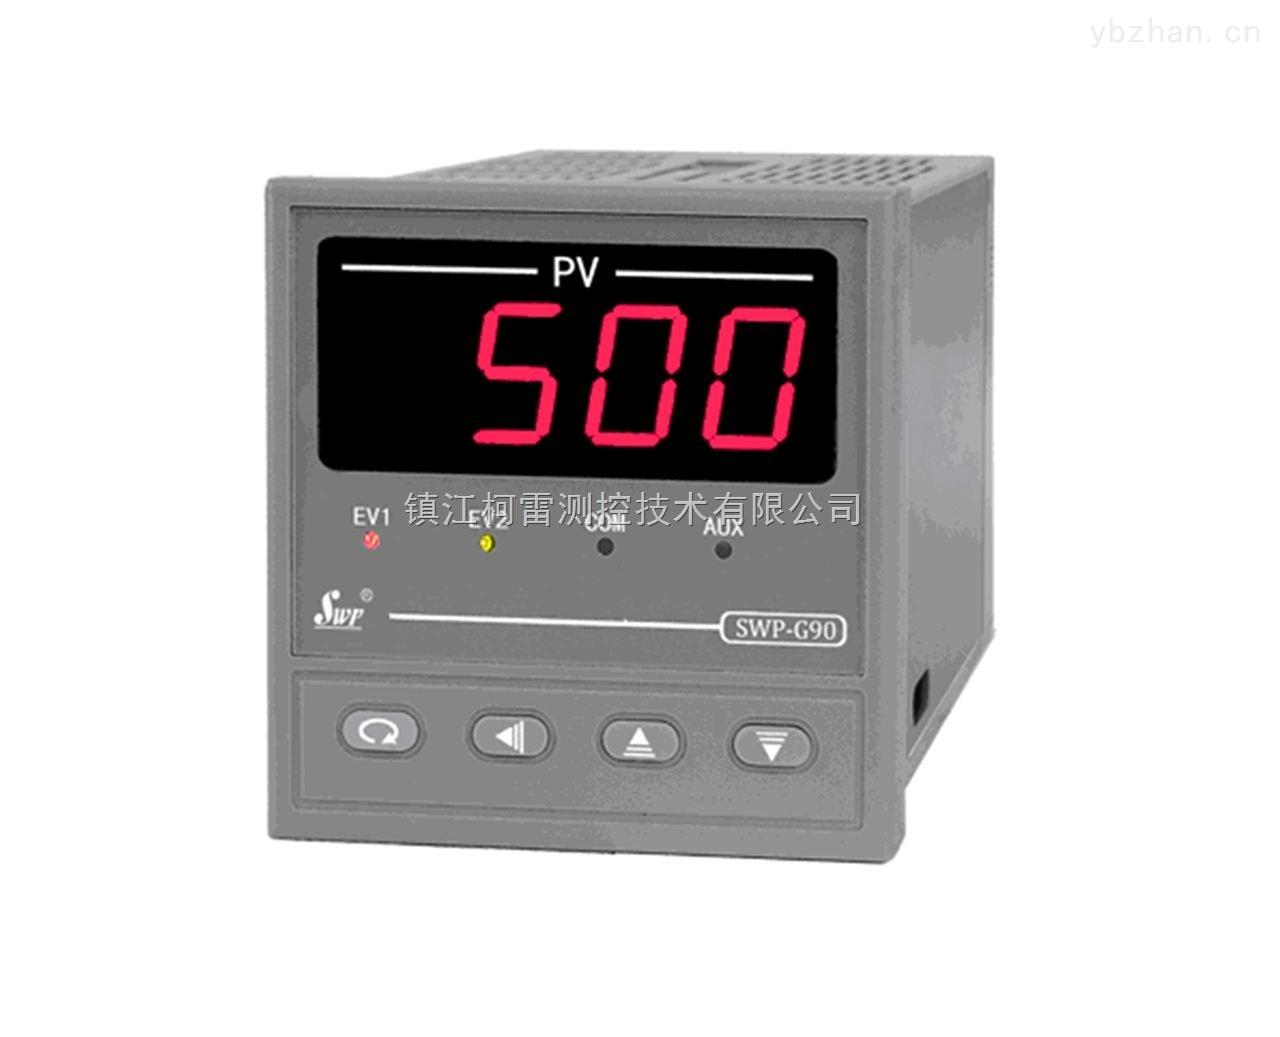 swp-c903-02-08-hl 智能数字温控仪